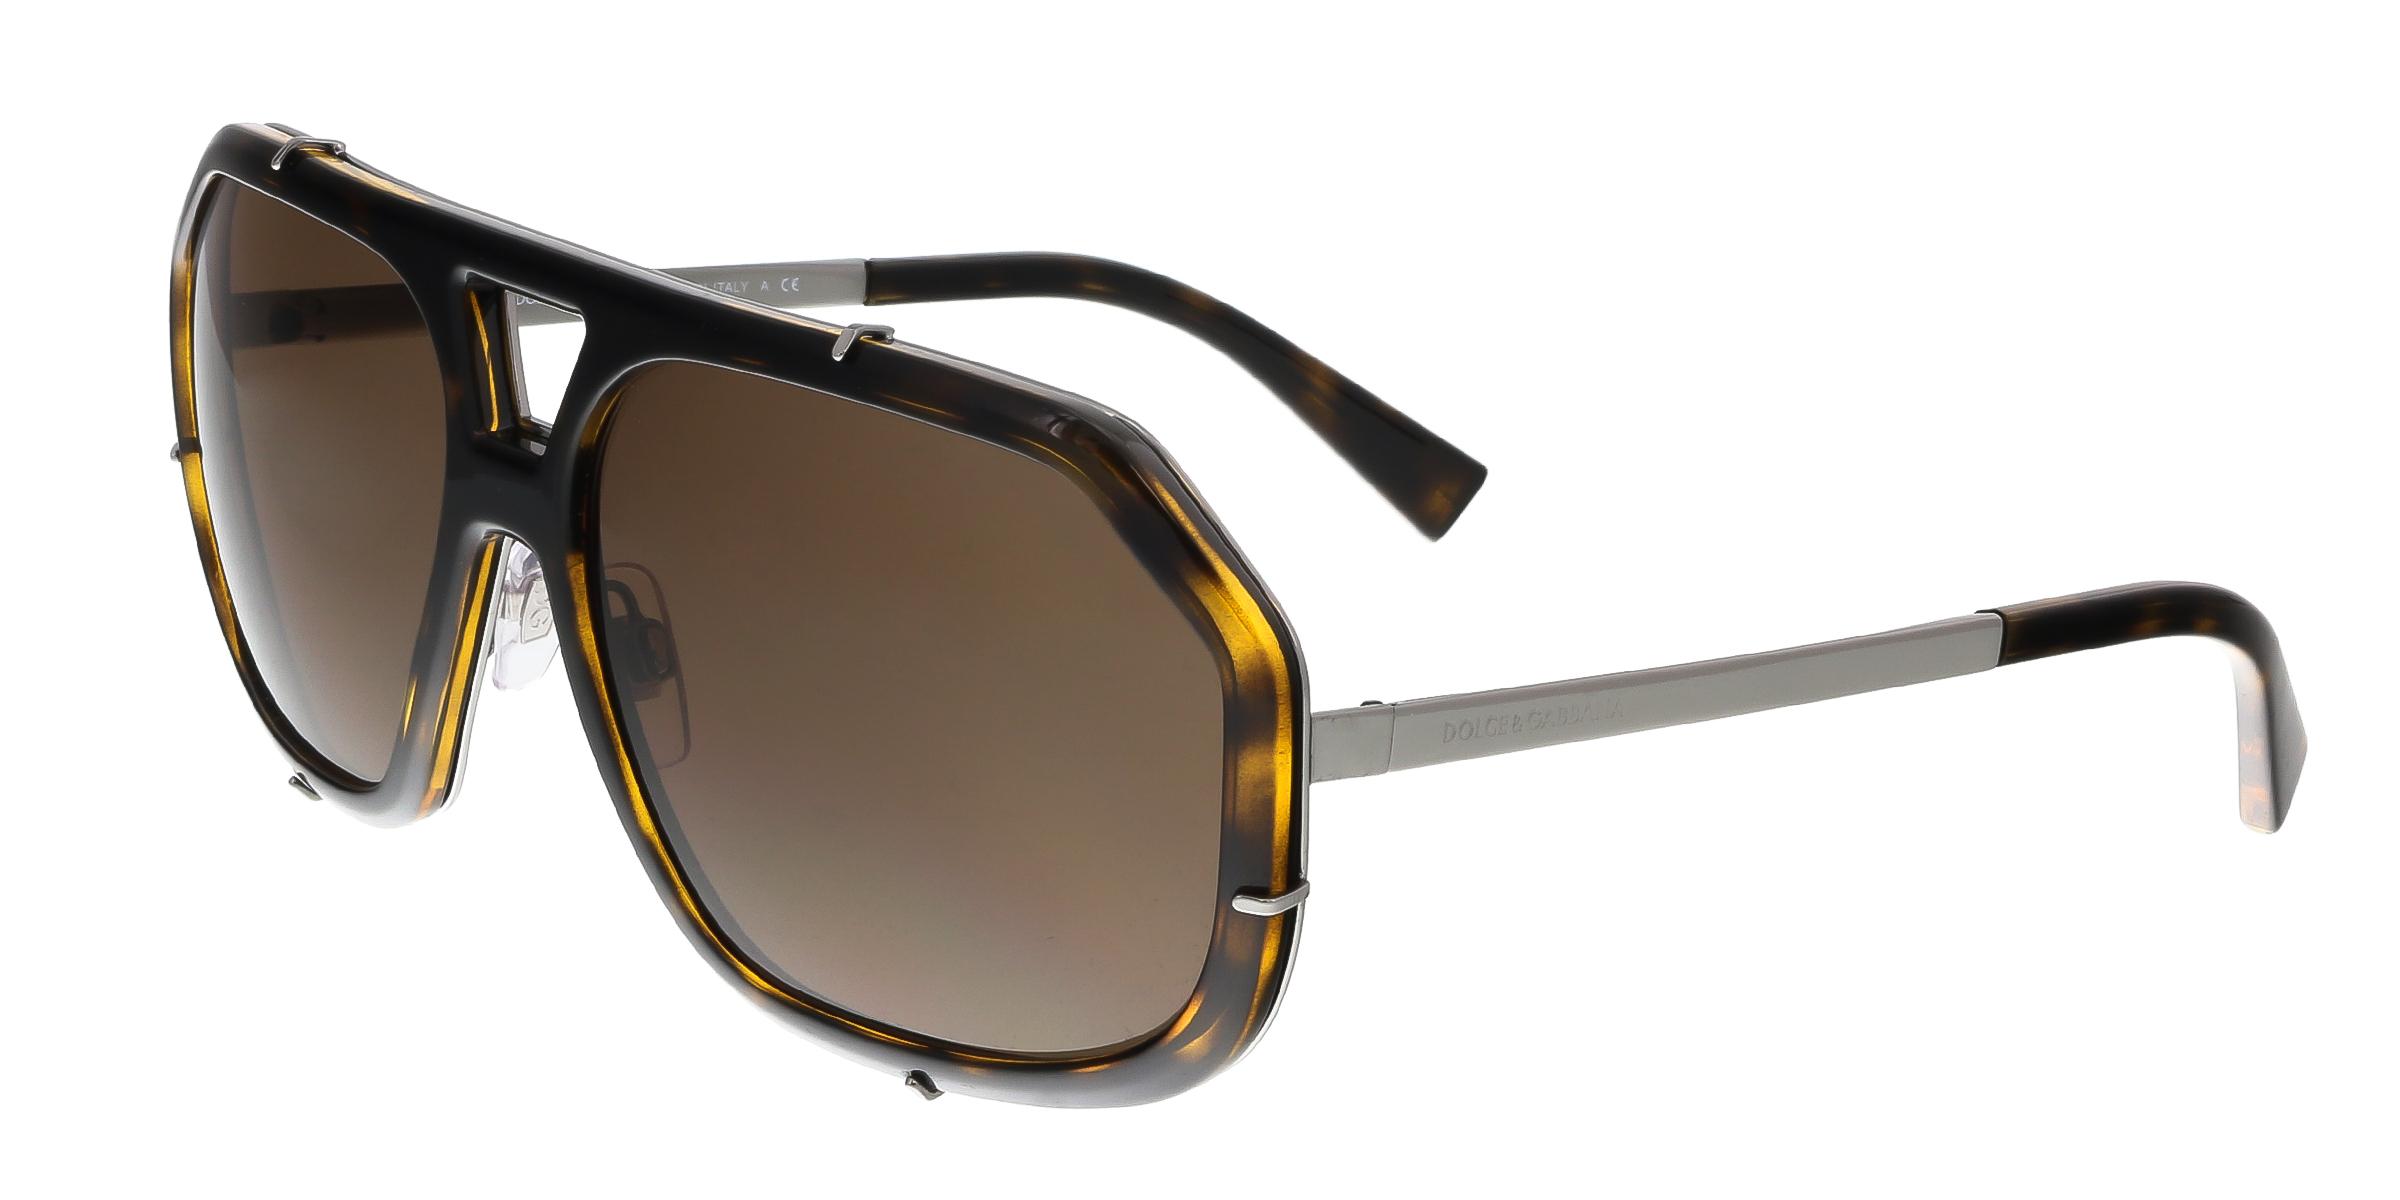 Dolce & Gabbana DG2167 04/73 Havana Aviator Sunglasses